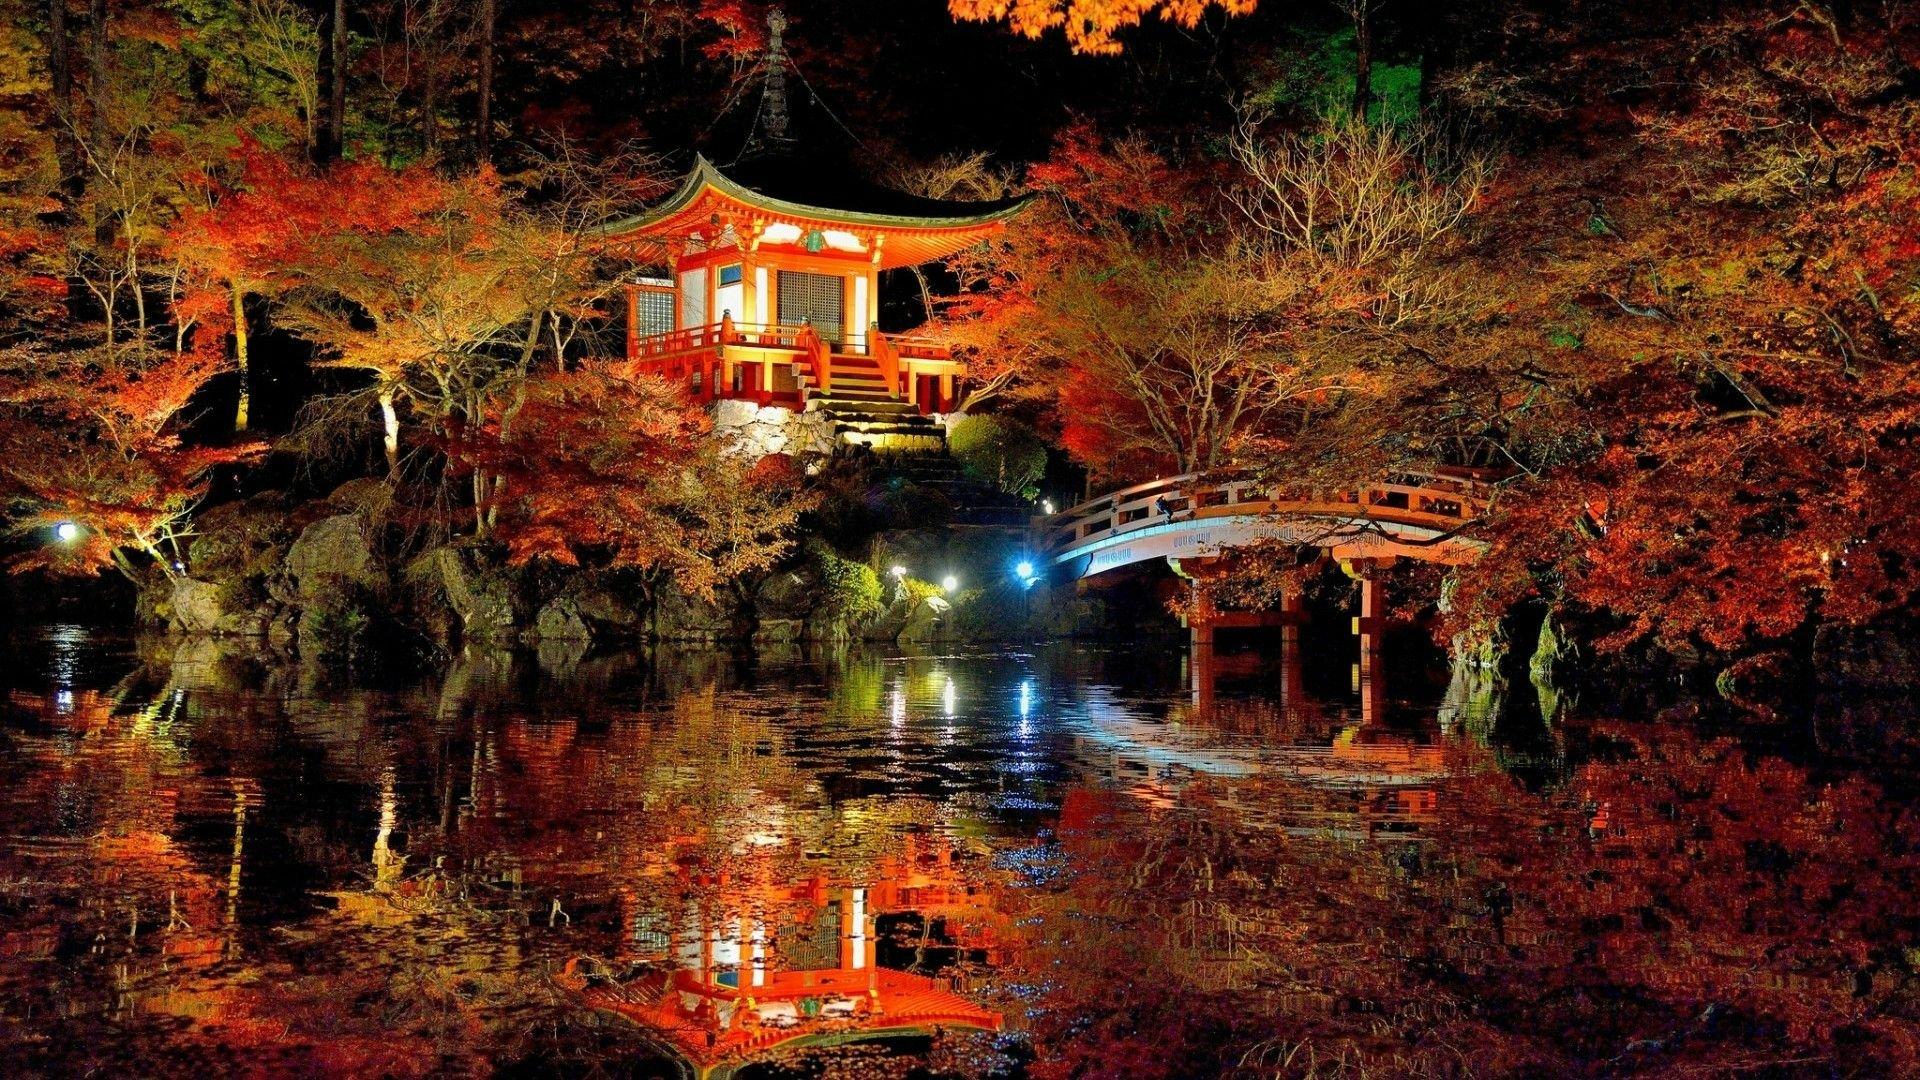 Fall Leaves Hd Wallpapers 1080p Lovely Japanese Garden Hd Wallpaper